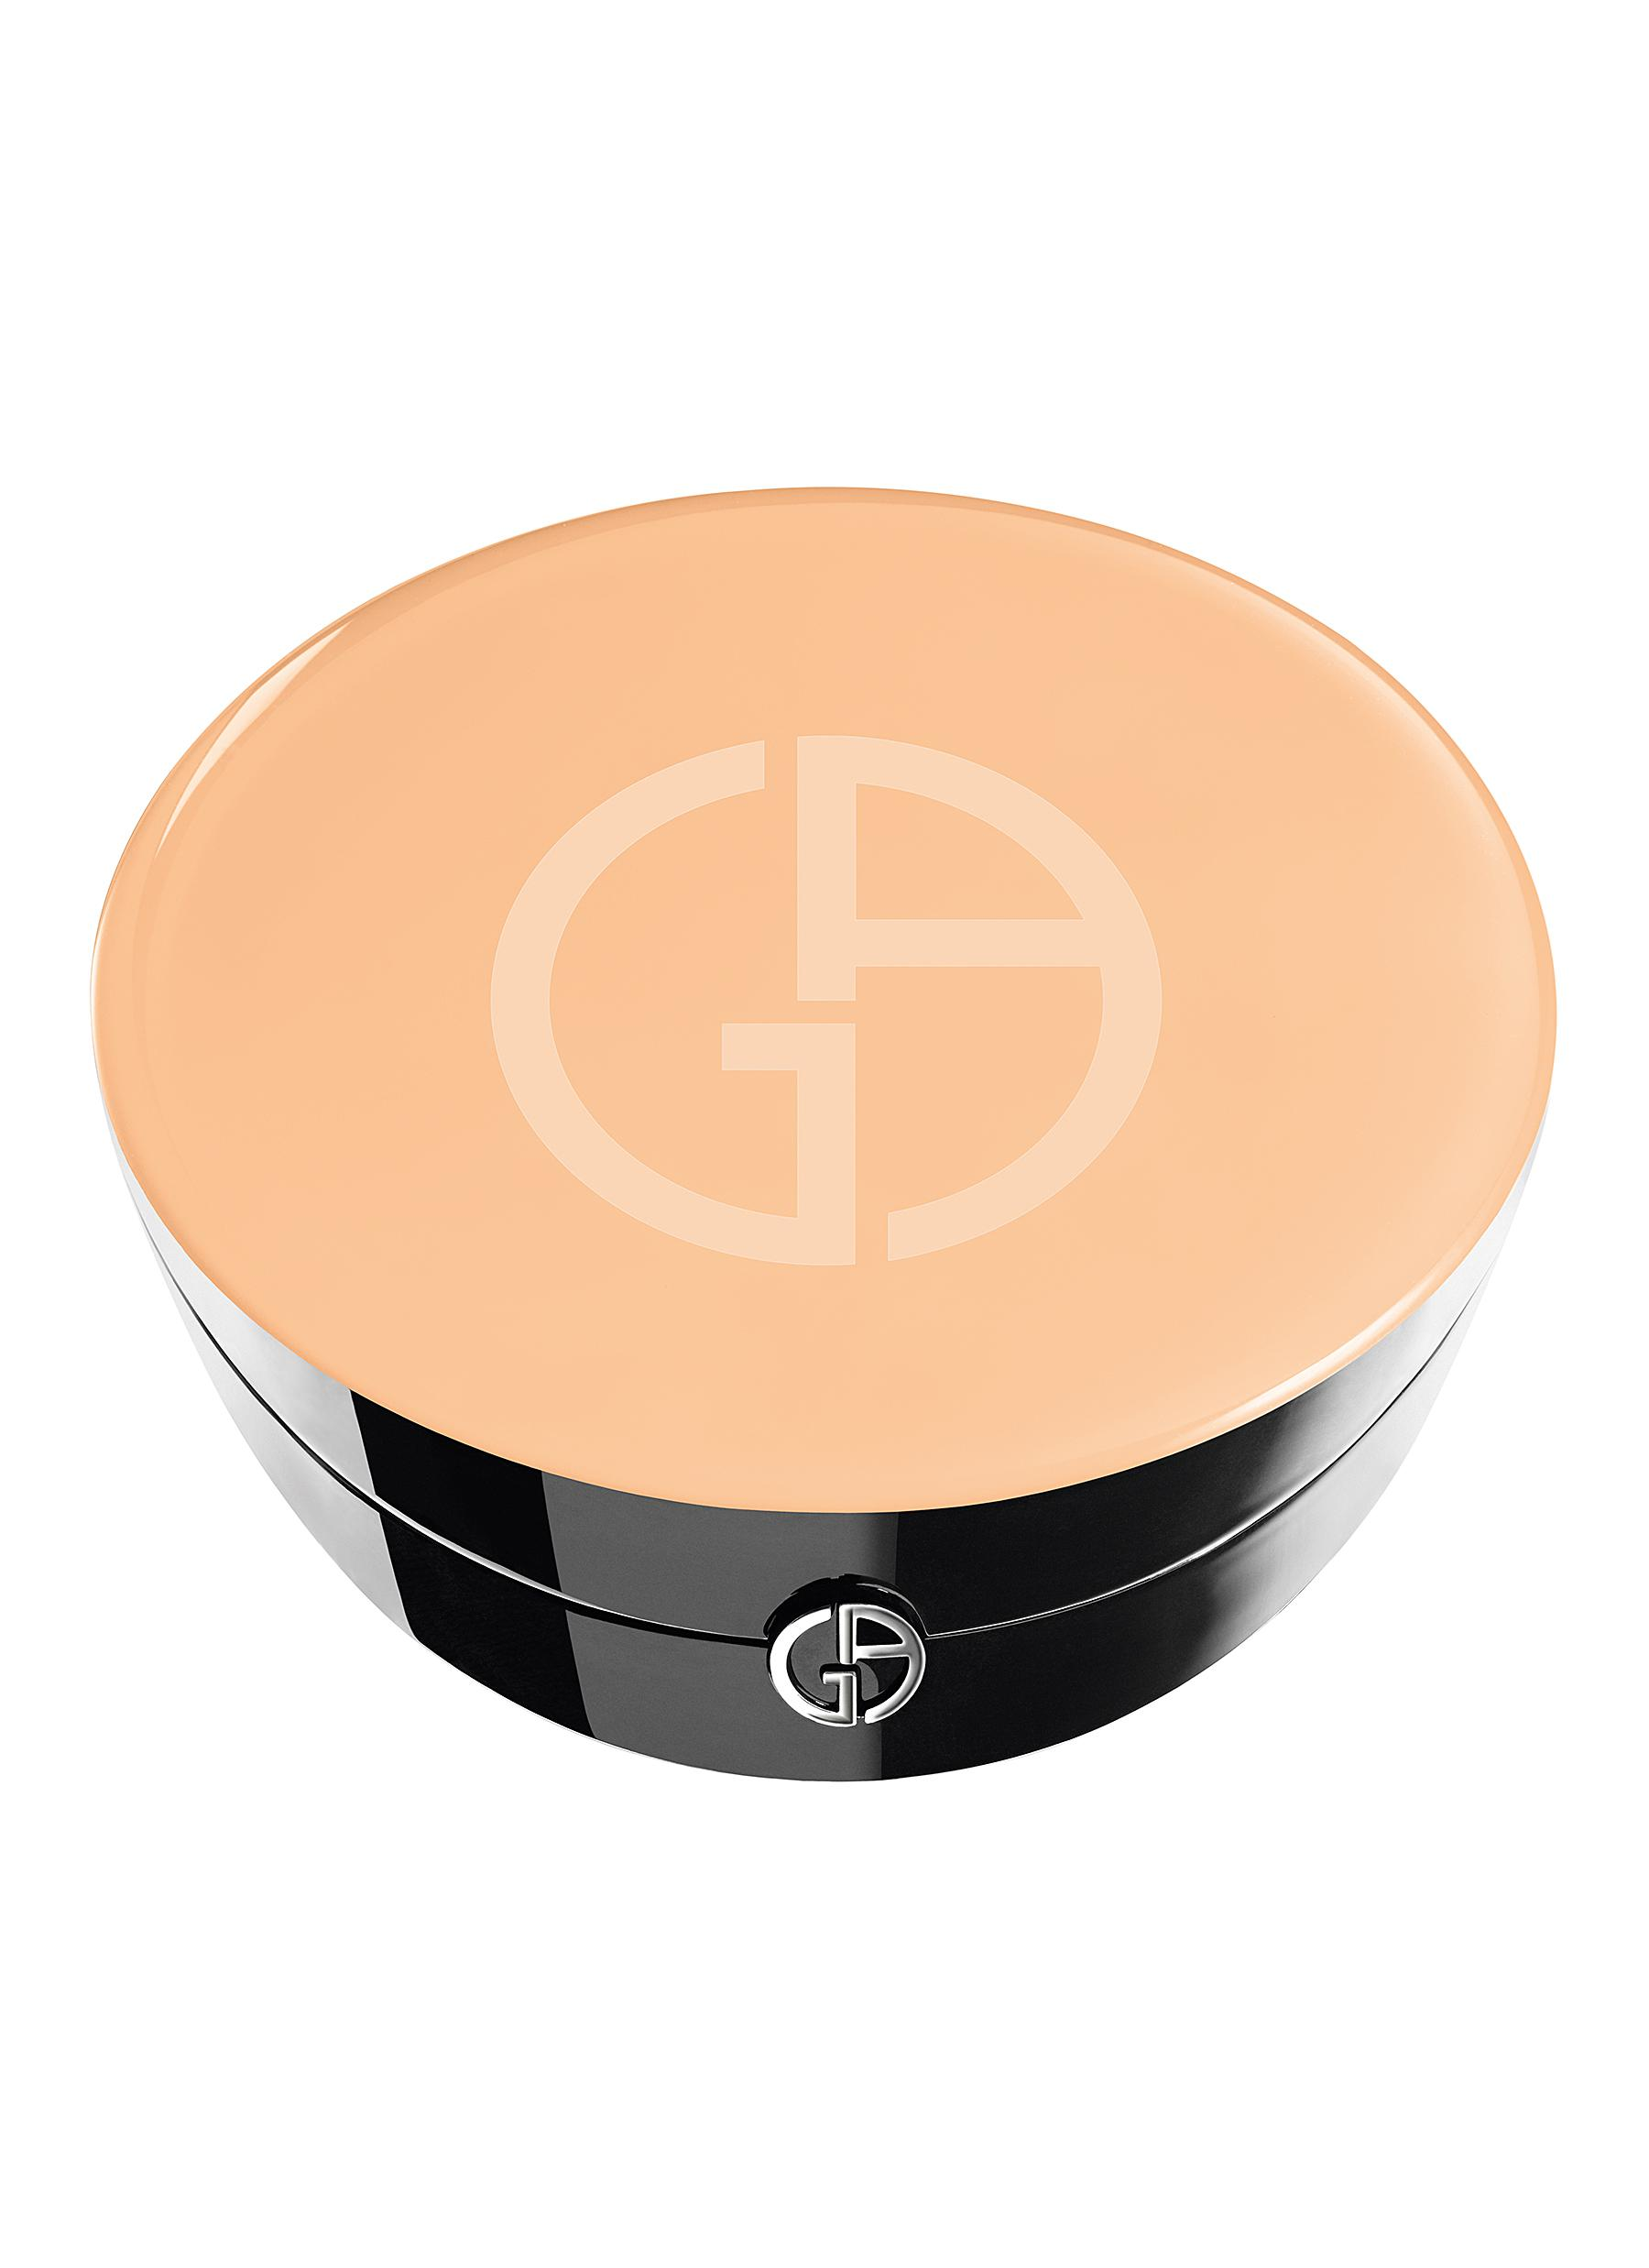 Giorgio Armani Beauty Neo Nude Compact Powder Foundation 3  -> Aki Carpetes